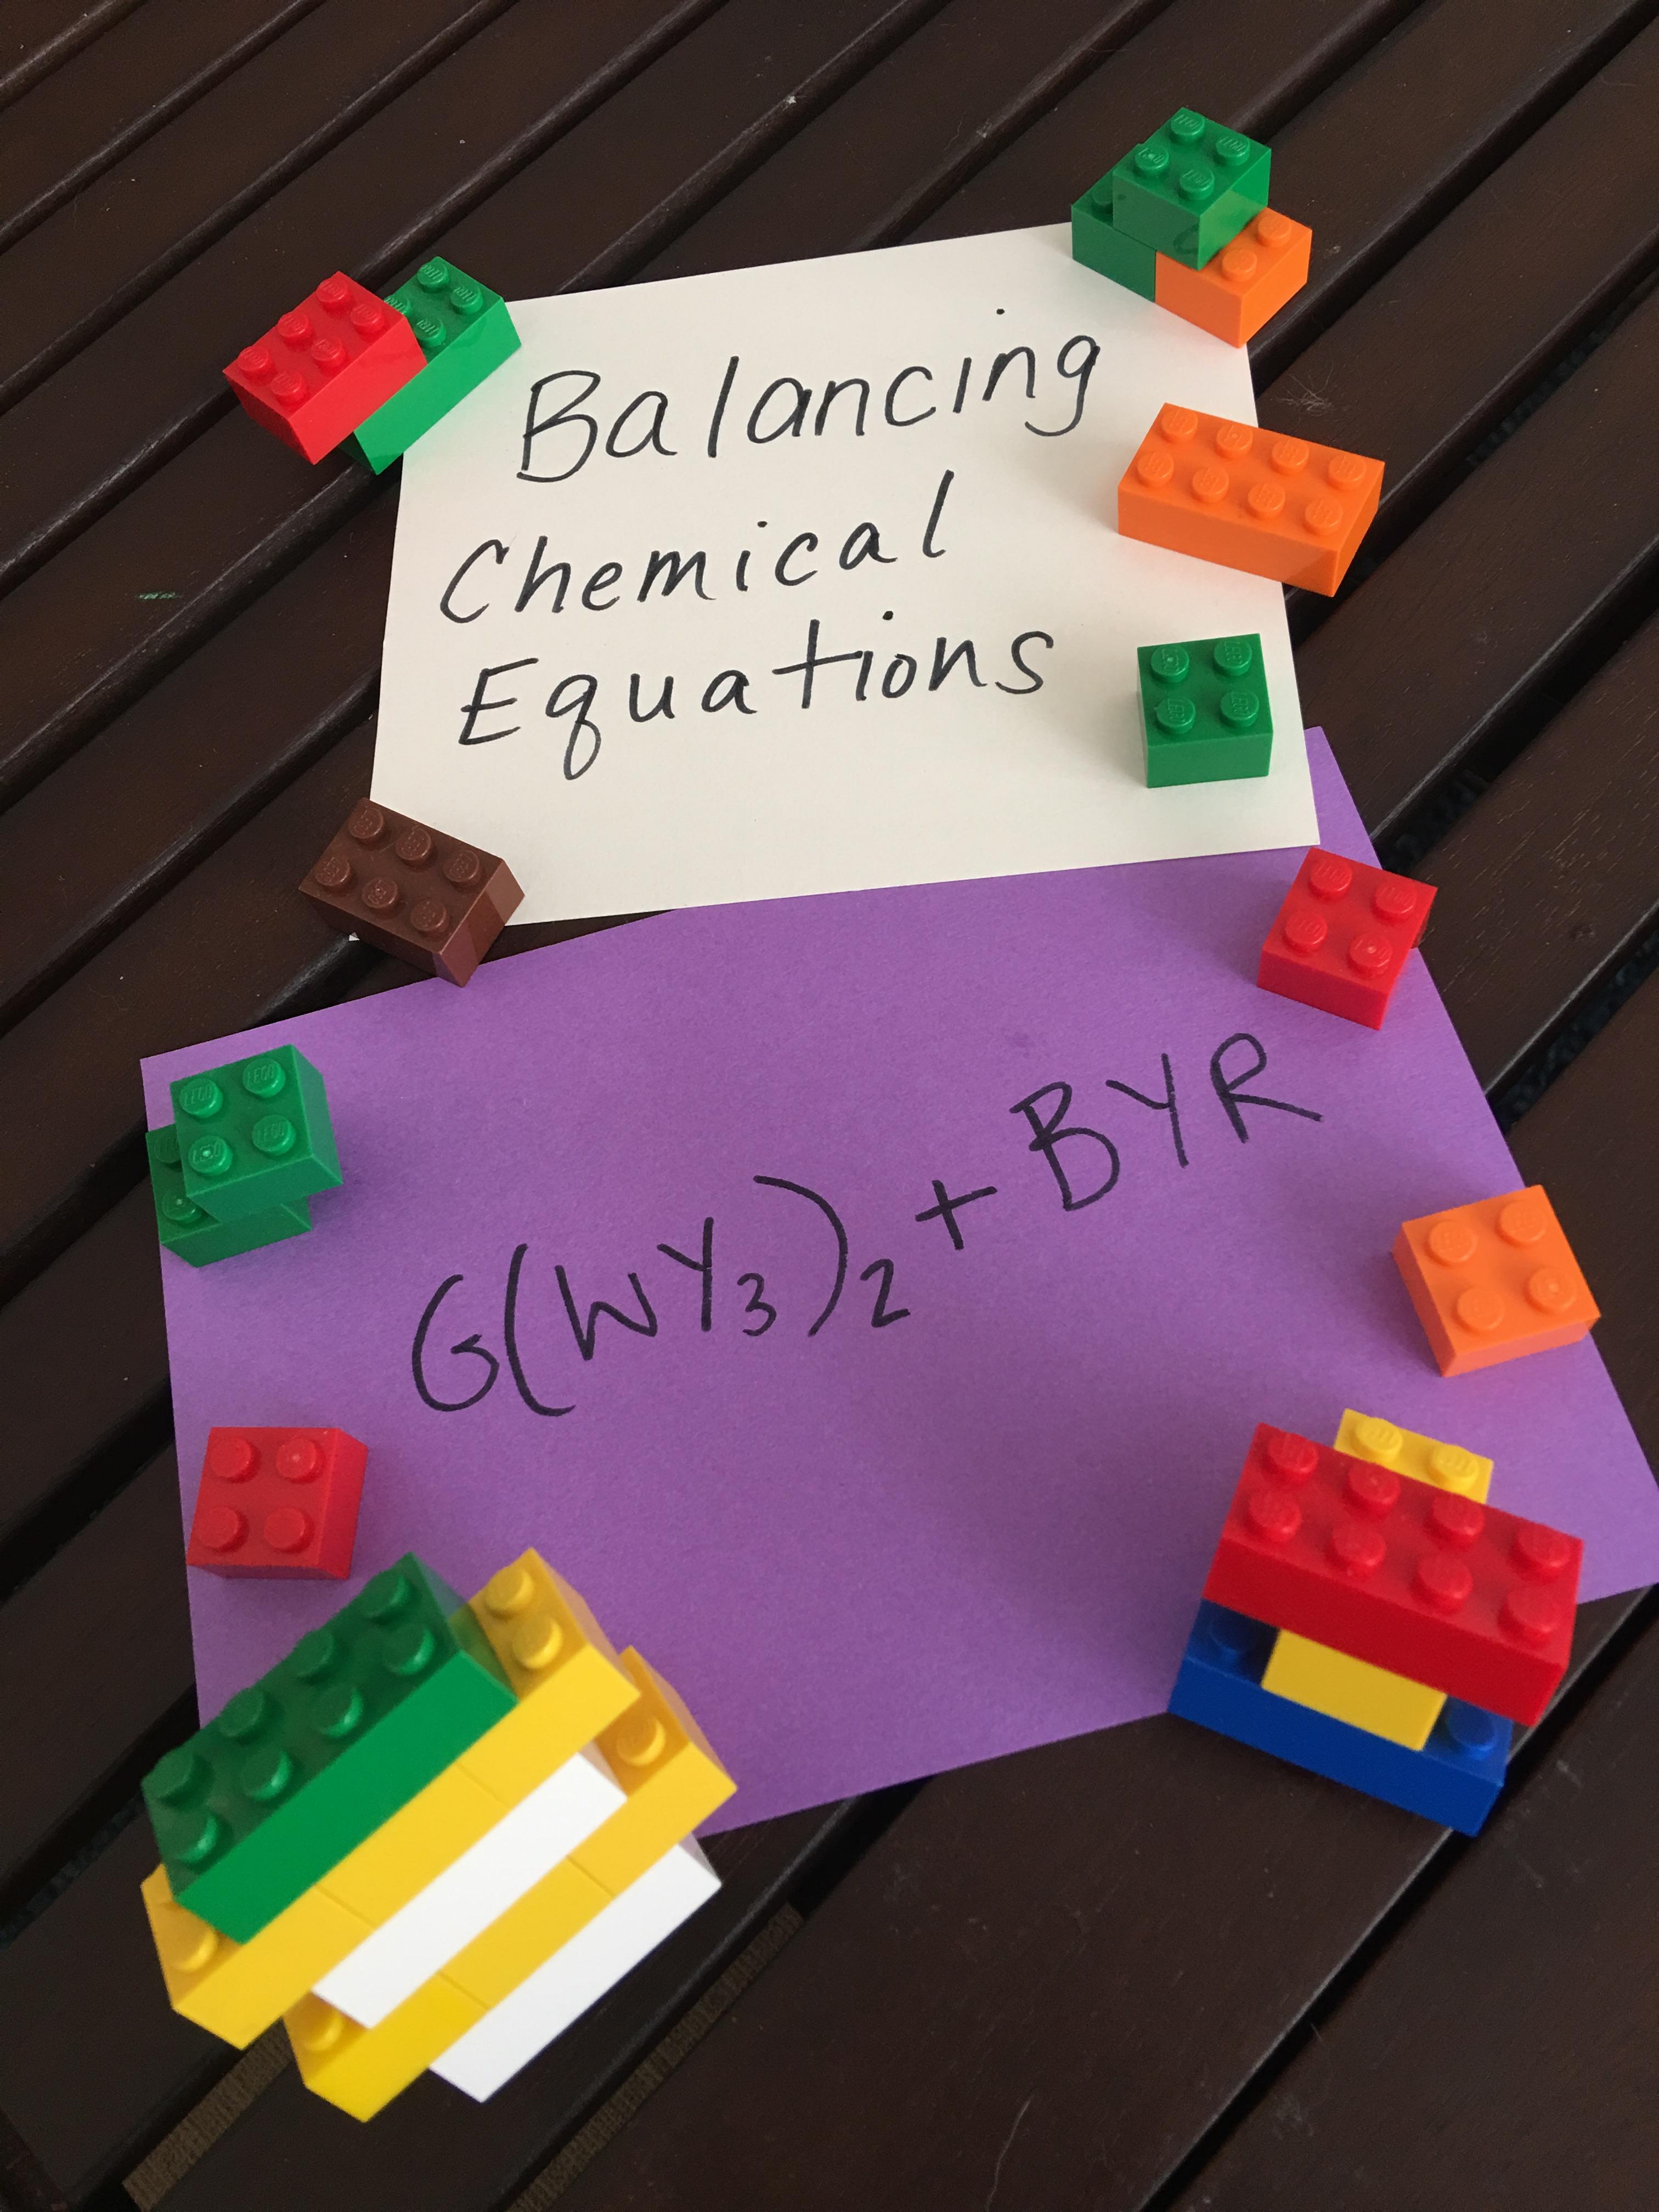 Balancing Chemical Equations With Lego Bricks